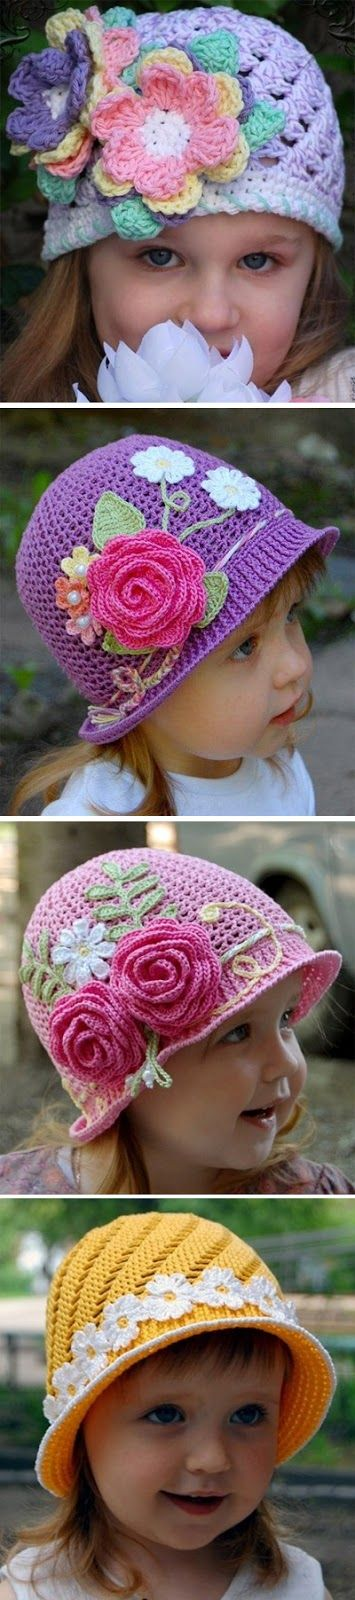 Baby hats crocheted.  Caps, hats and panama DIY tutorial http://www.handmadiya.com/2012/05/blog-post_05.html